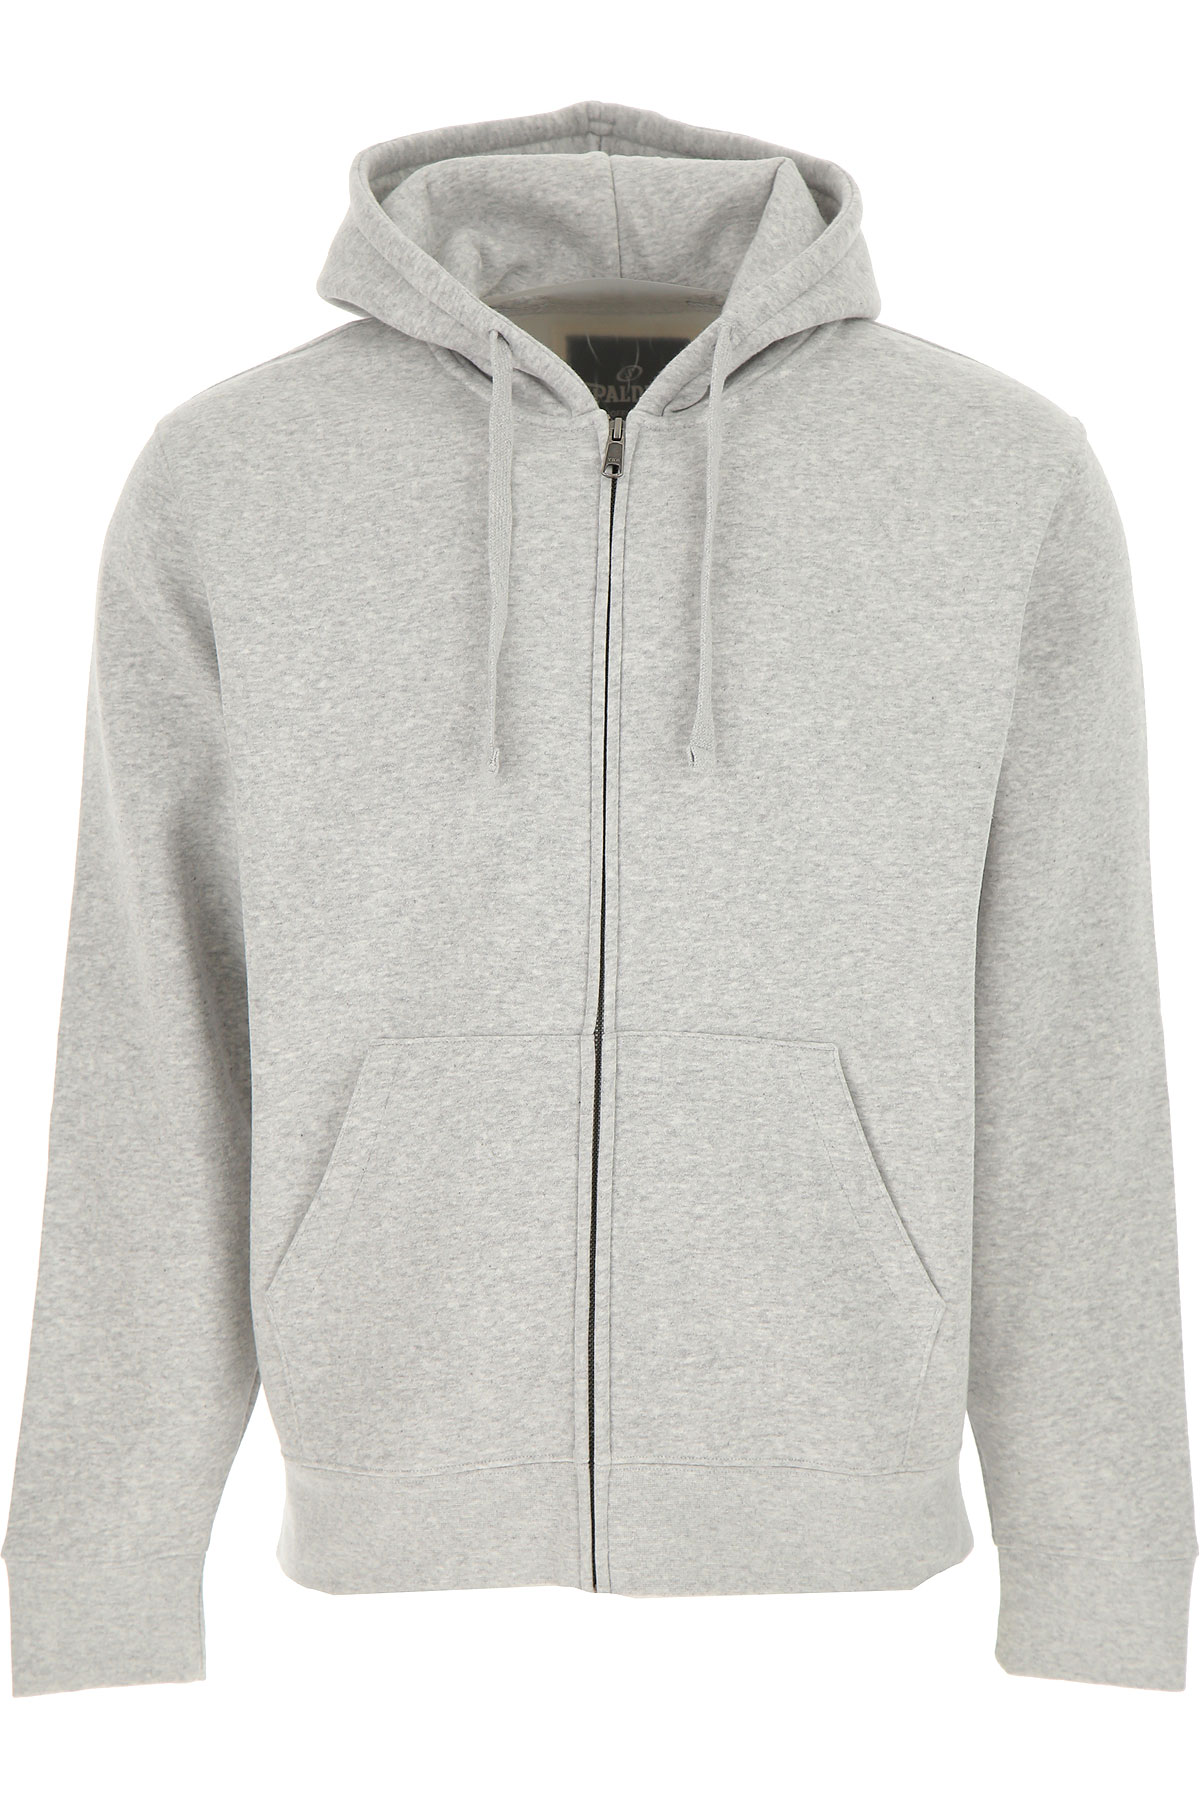 Spalding Sweatshirt for Men On Sale, Grey, Cotton, 2019, L M XL XXL